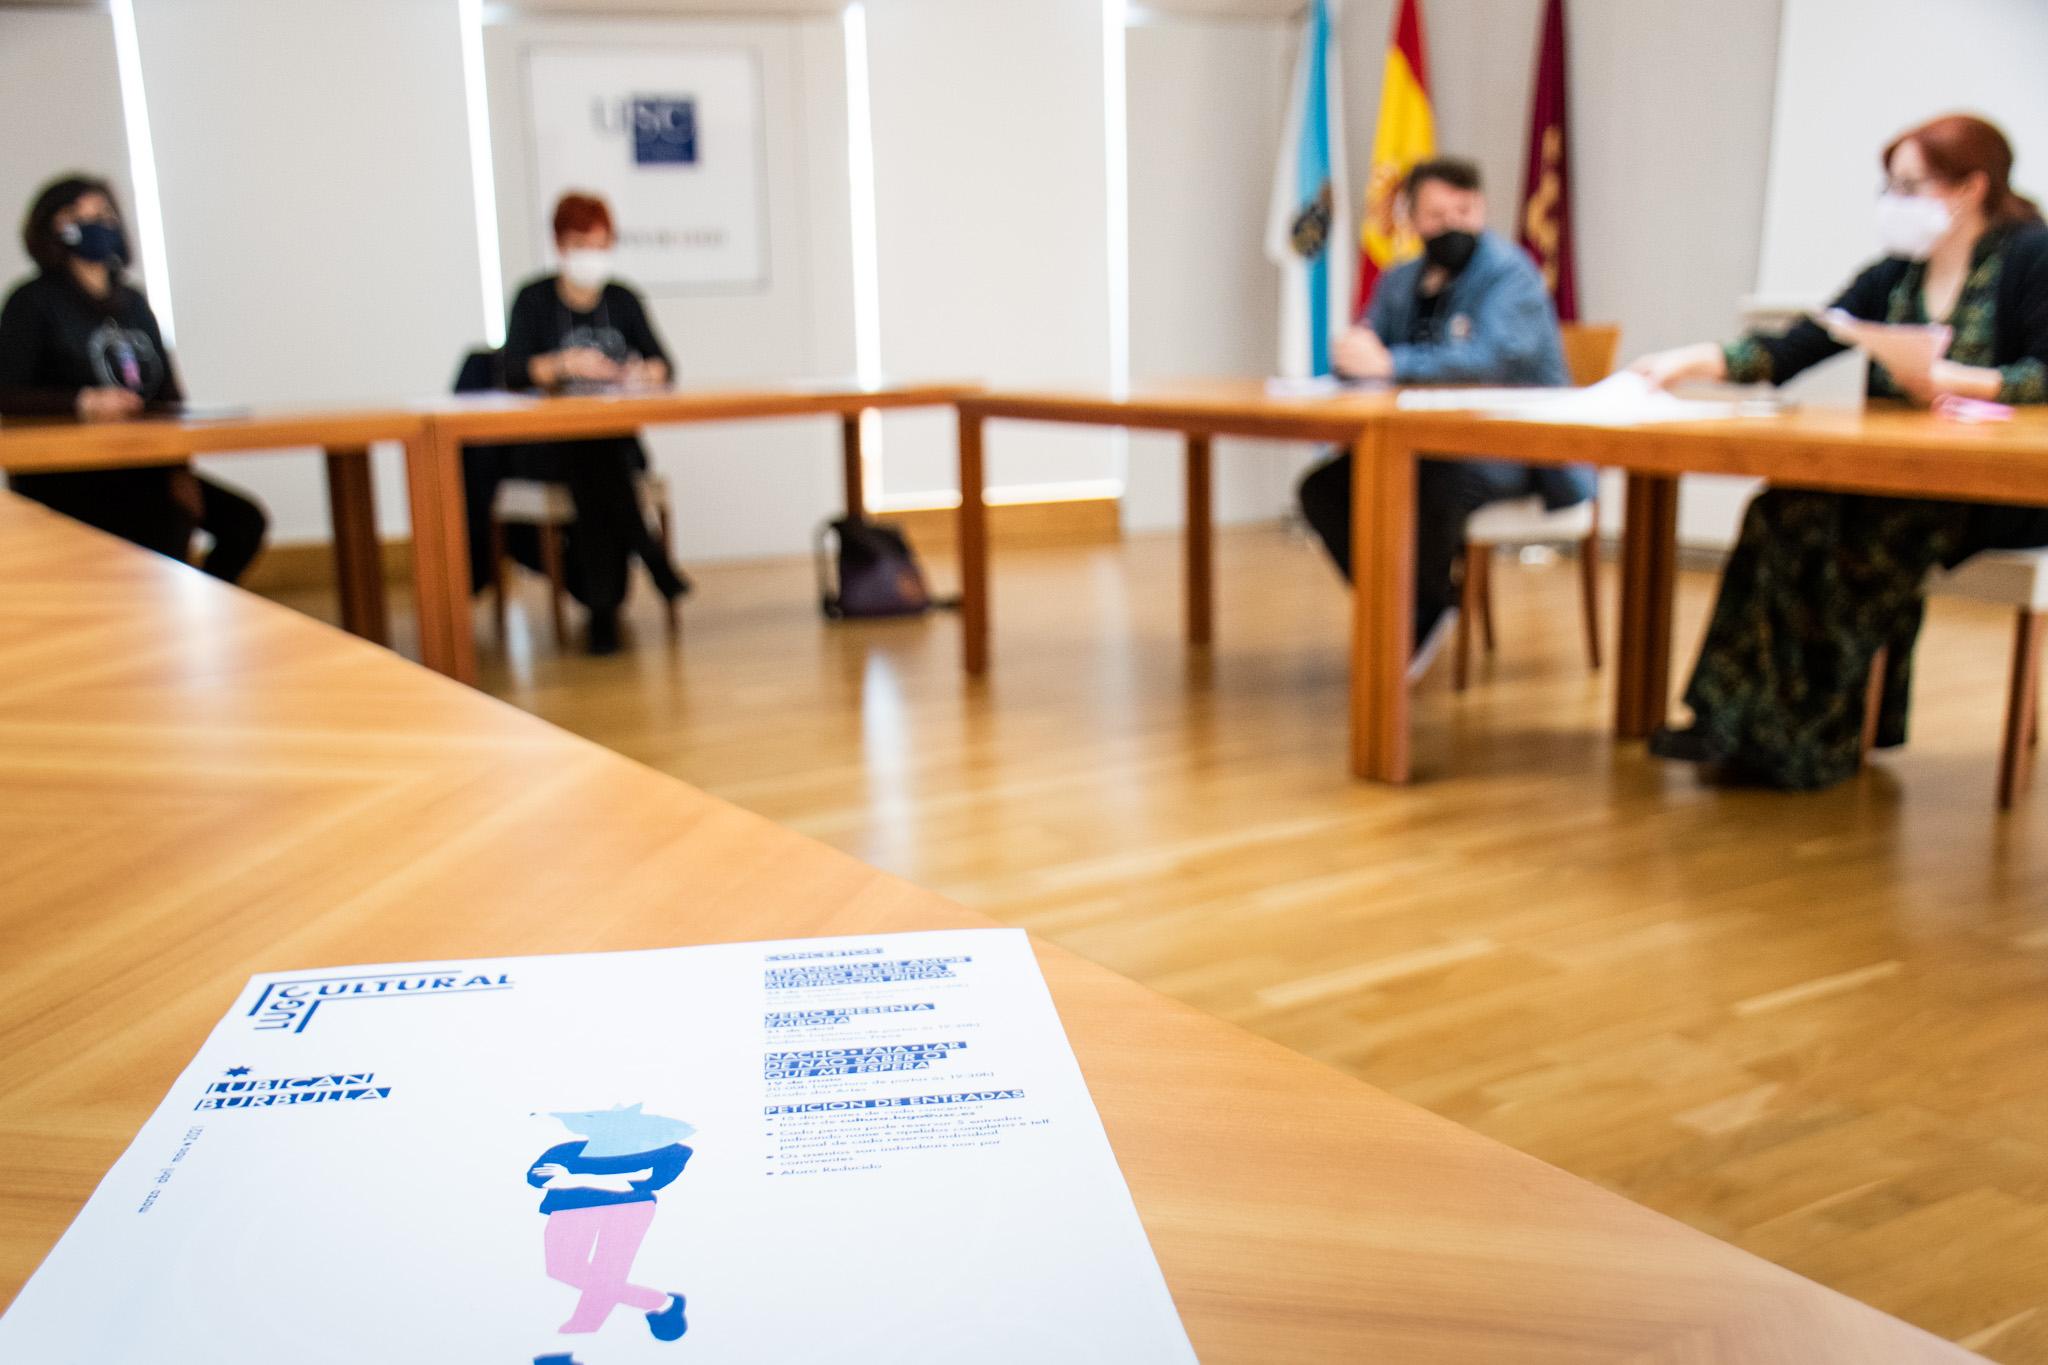 Lugo cultural 2021